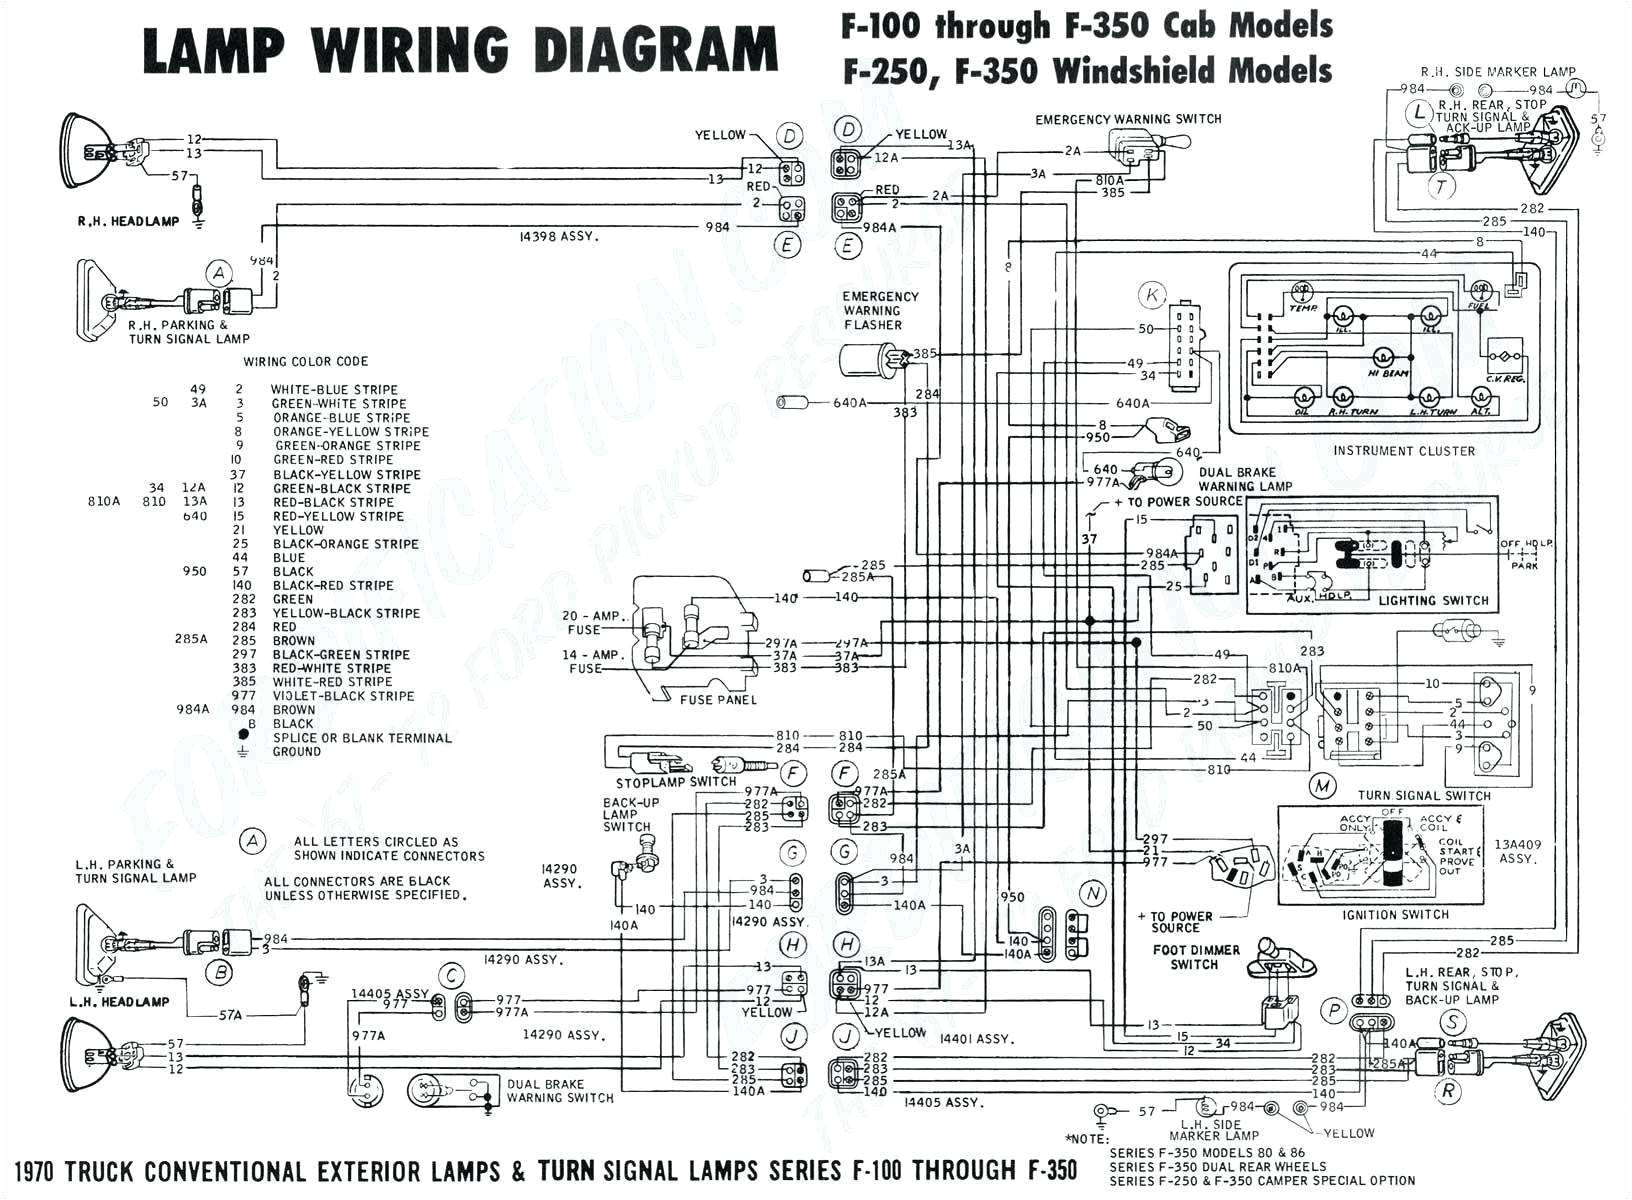 02 dodge 4 7 engine diagram blog wiring diagram dodge durango 4 7 engine diagram